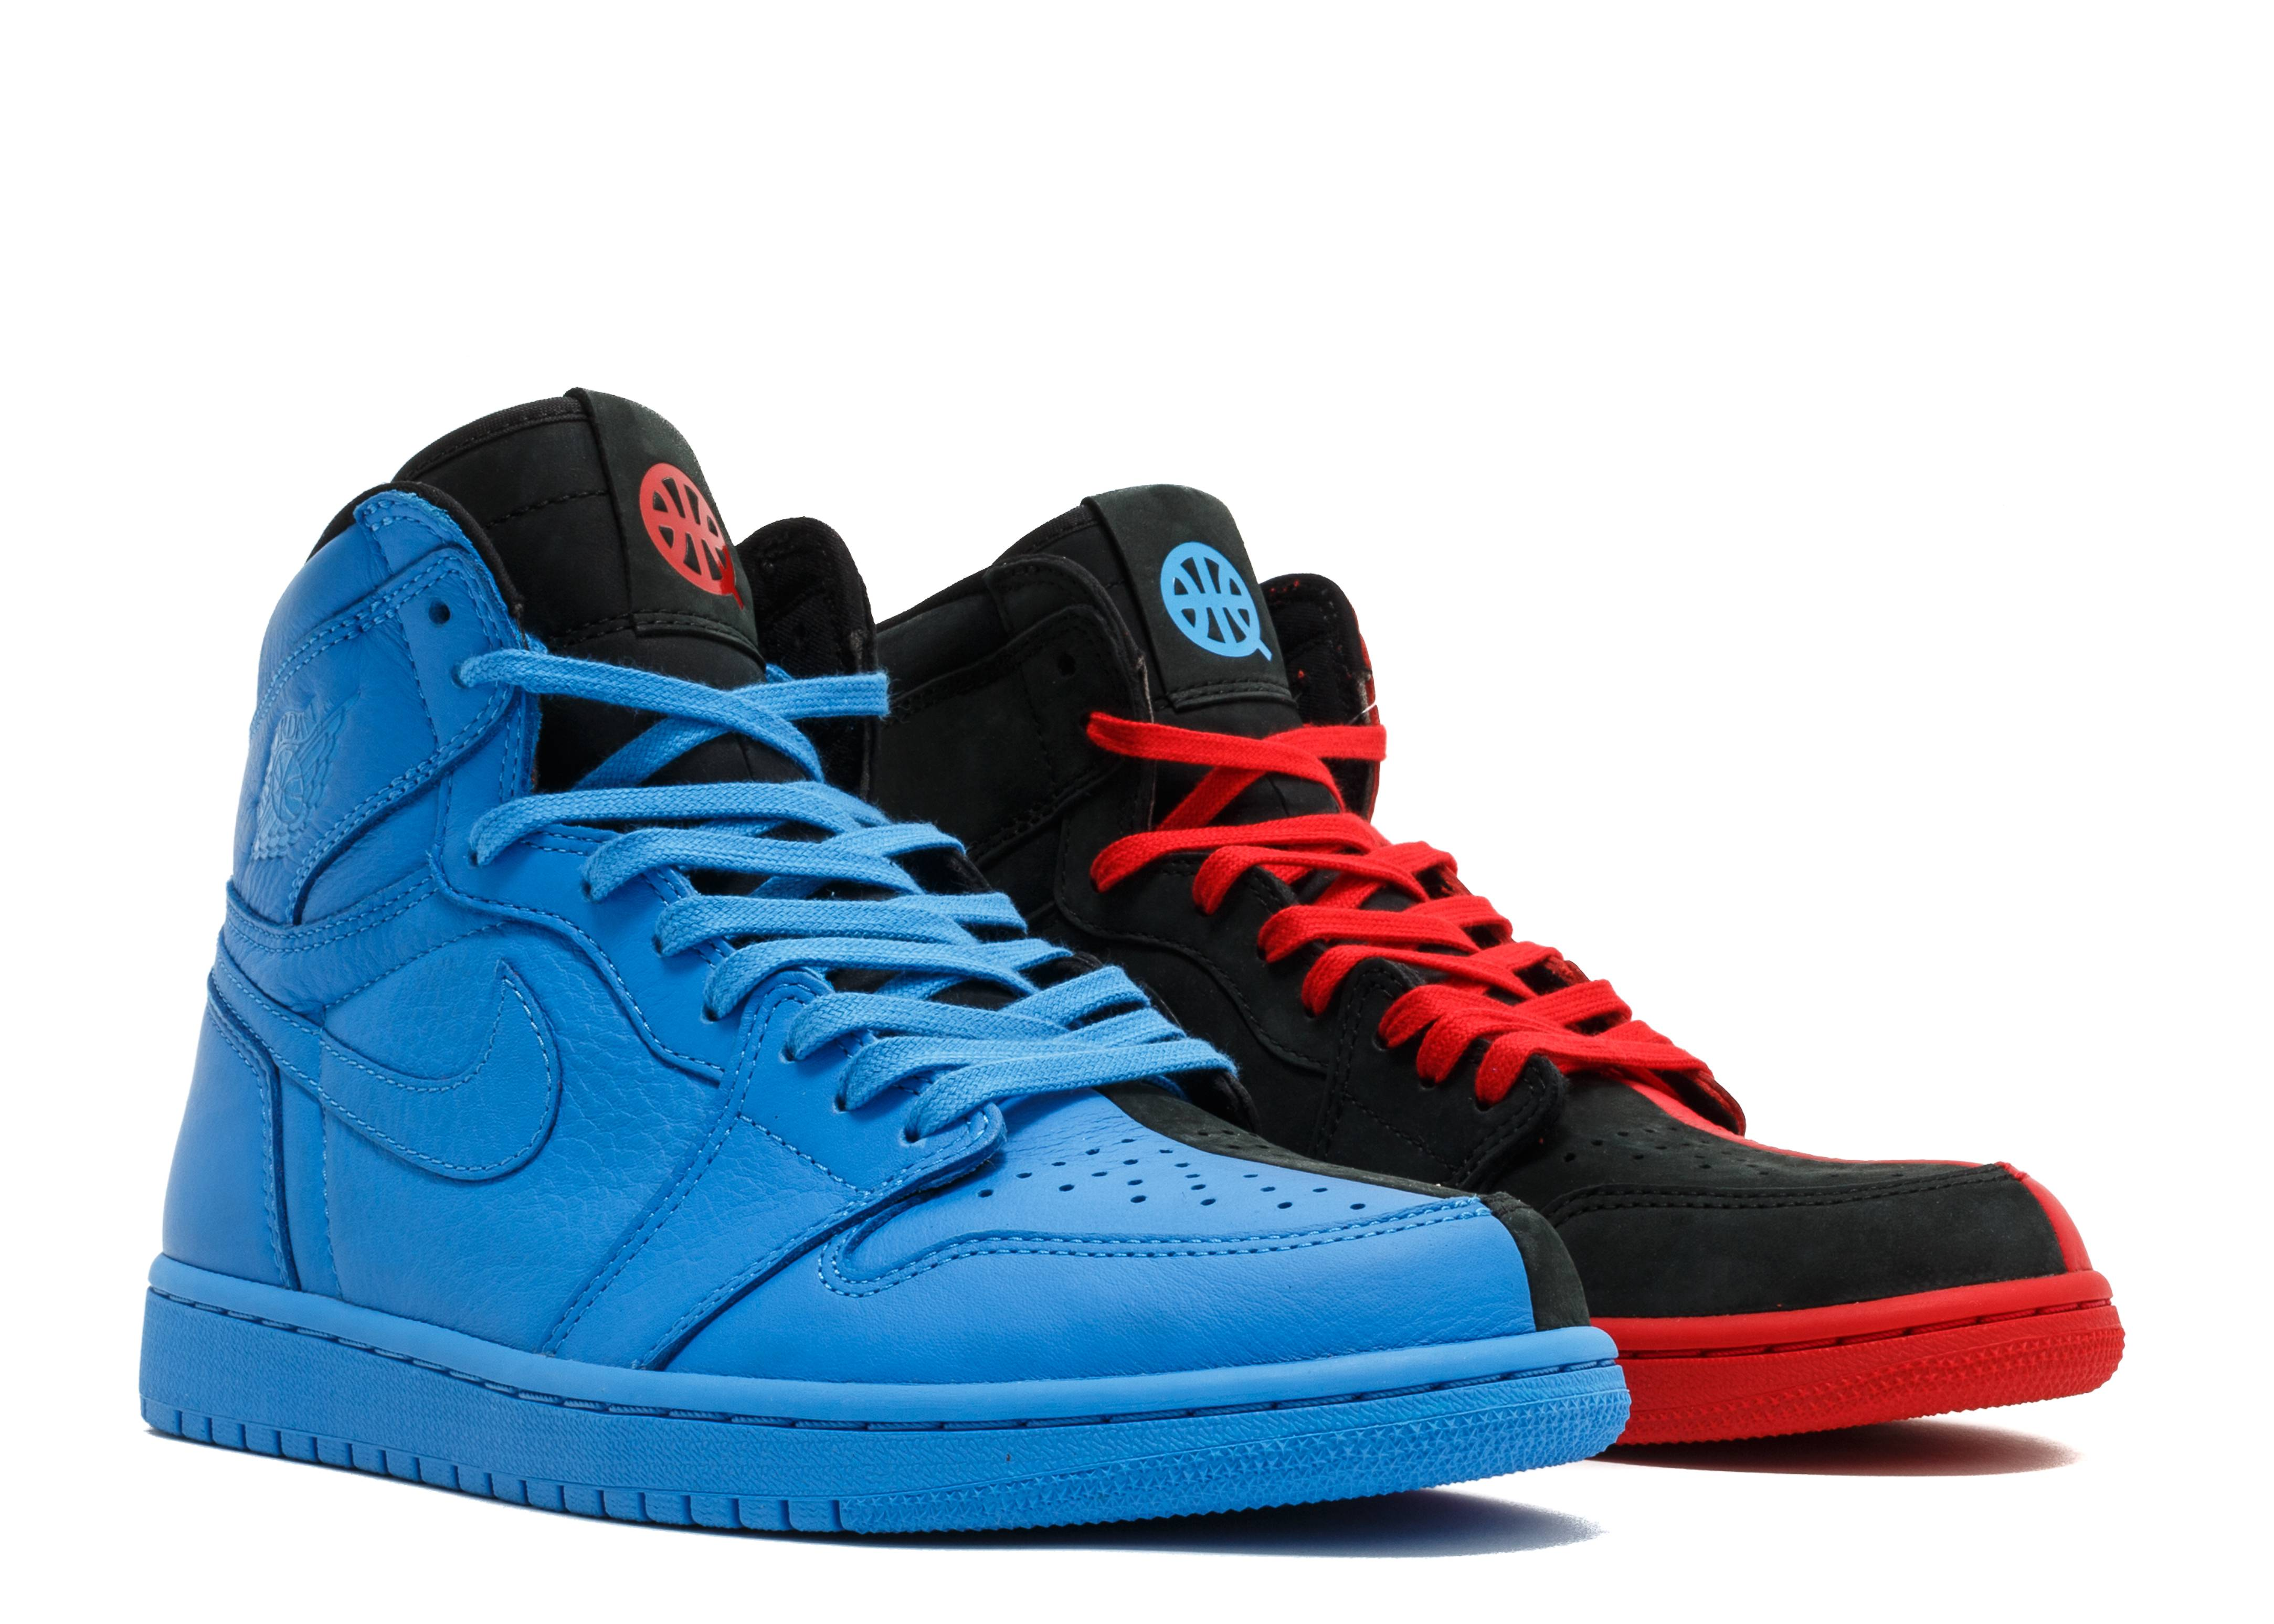 50% price wholesale sales uk availability Air Jordan 1 Retro High